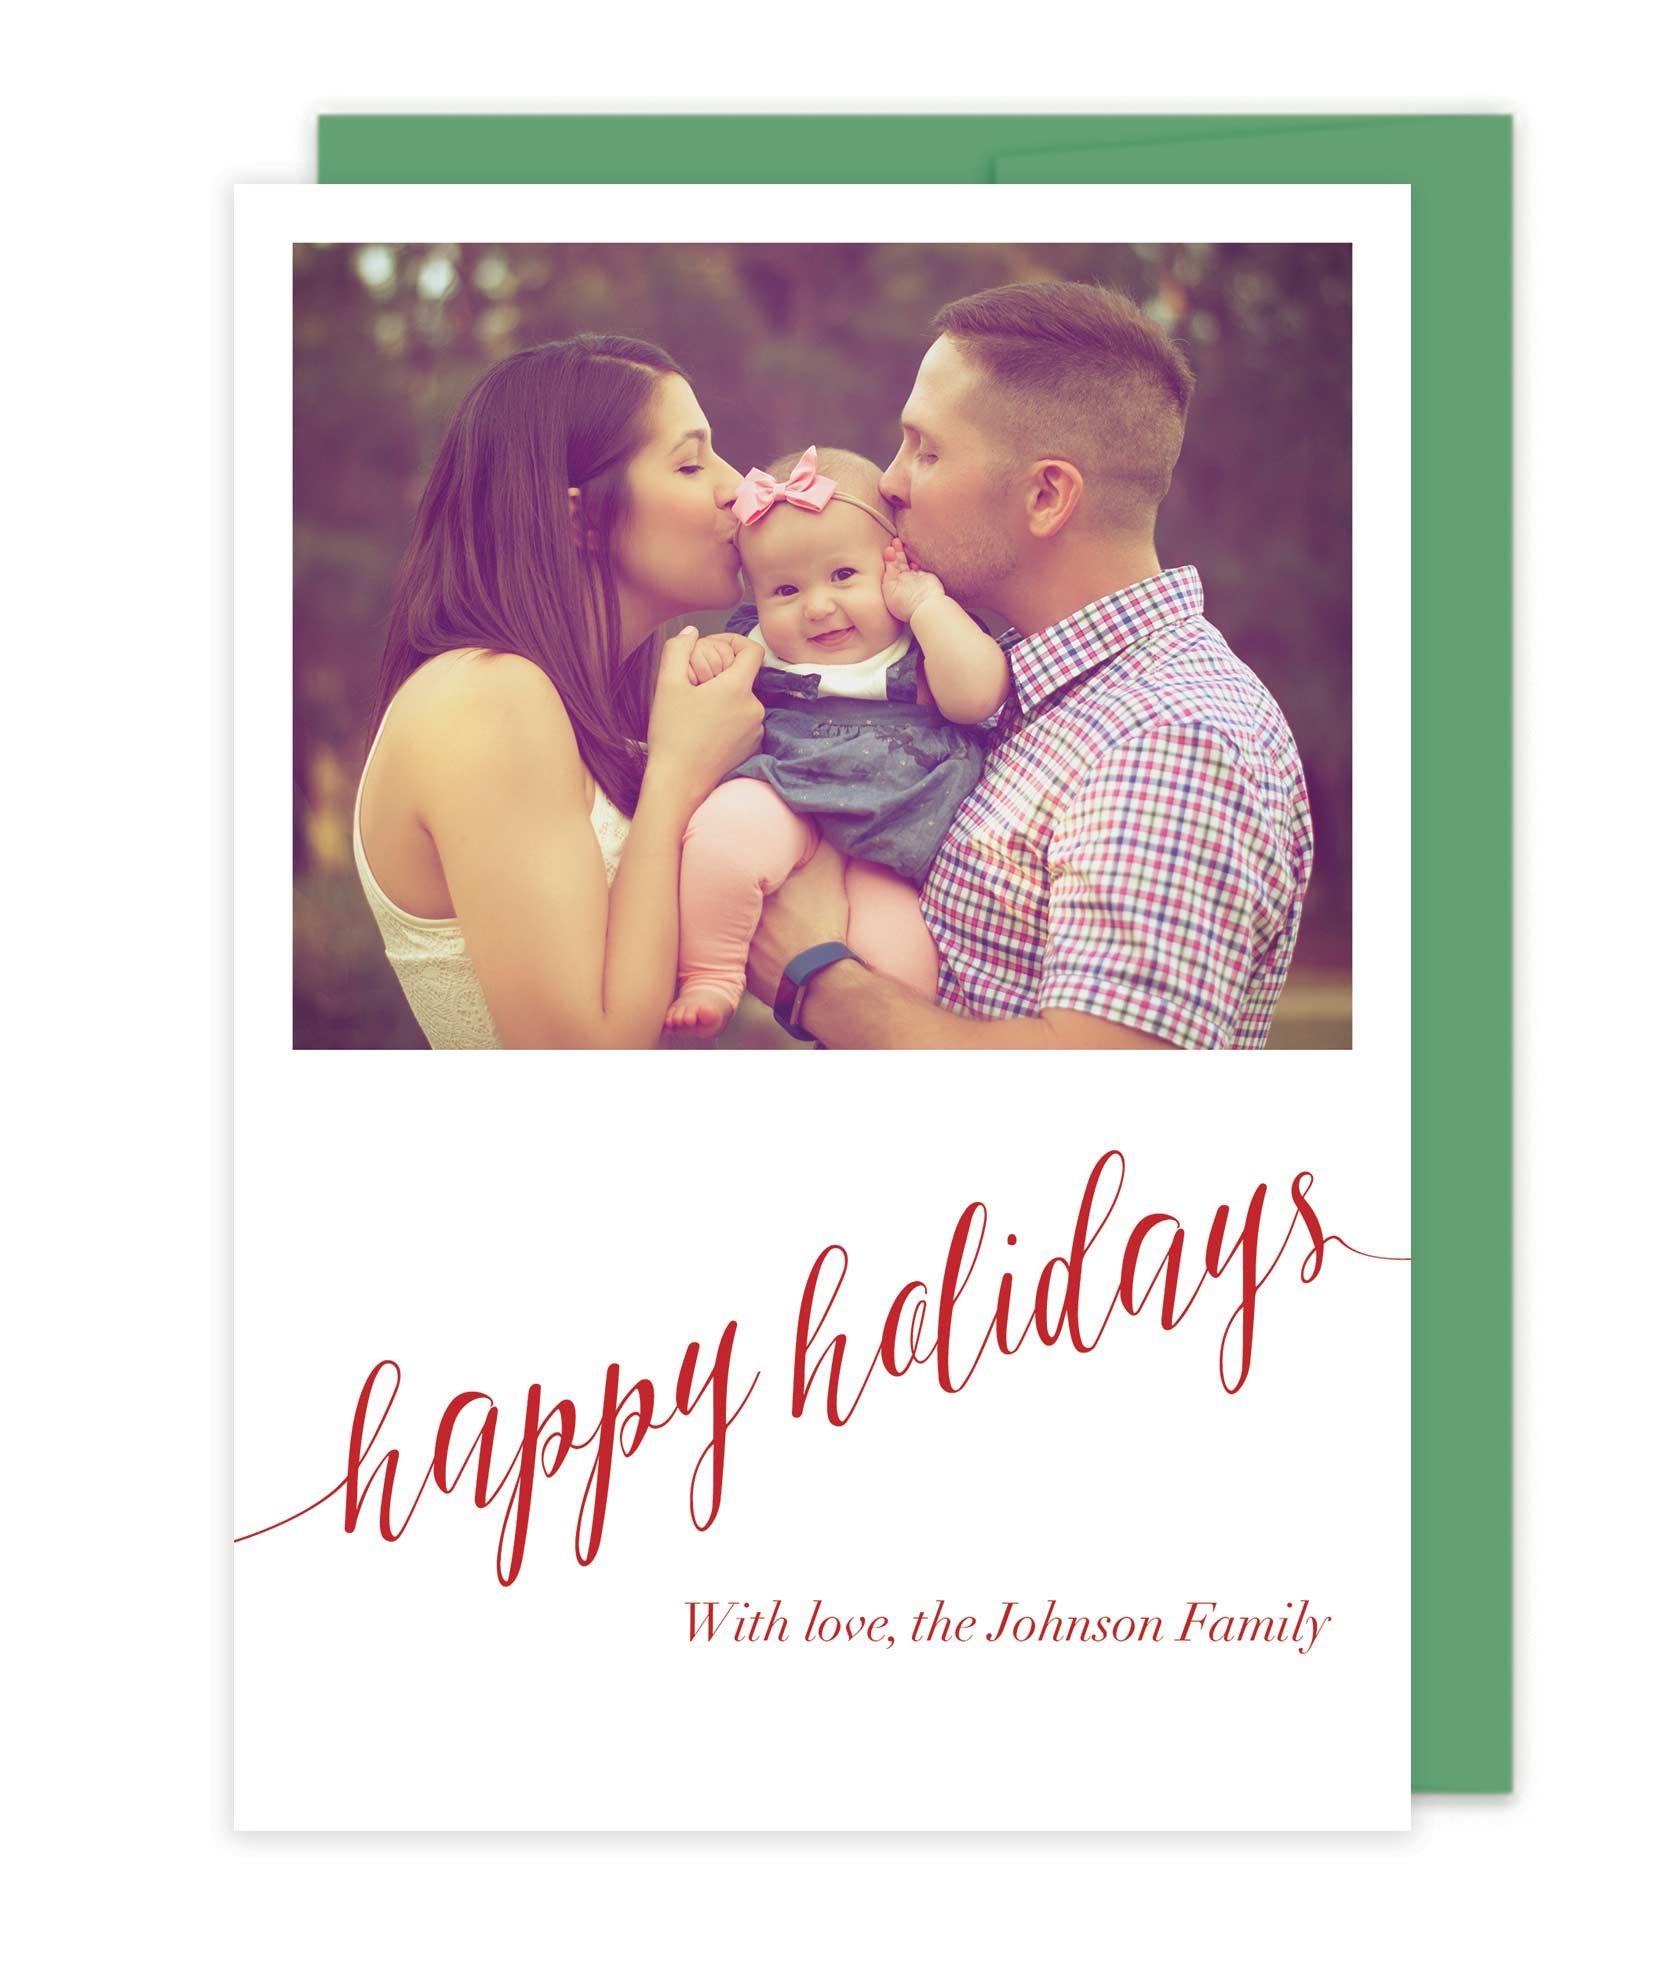 Photo Letterpress Christmas Cards - Happy Holidays